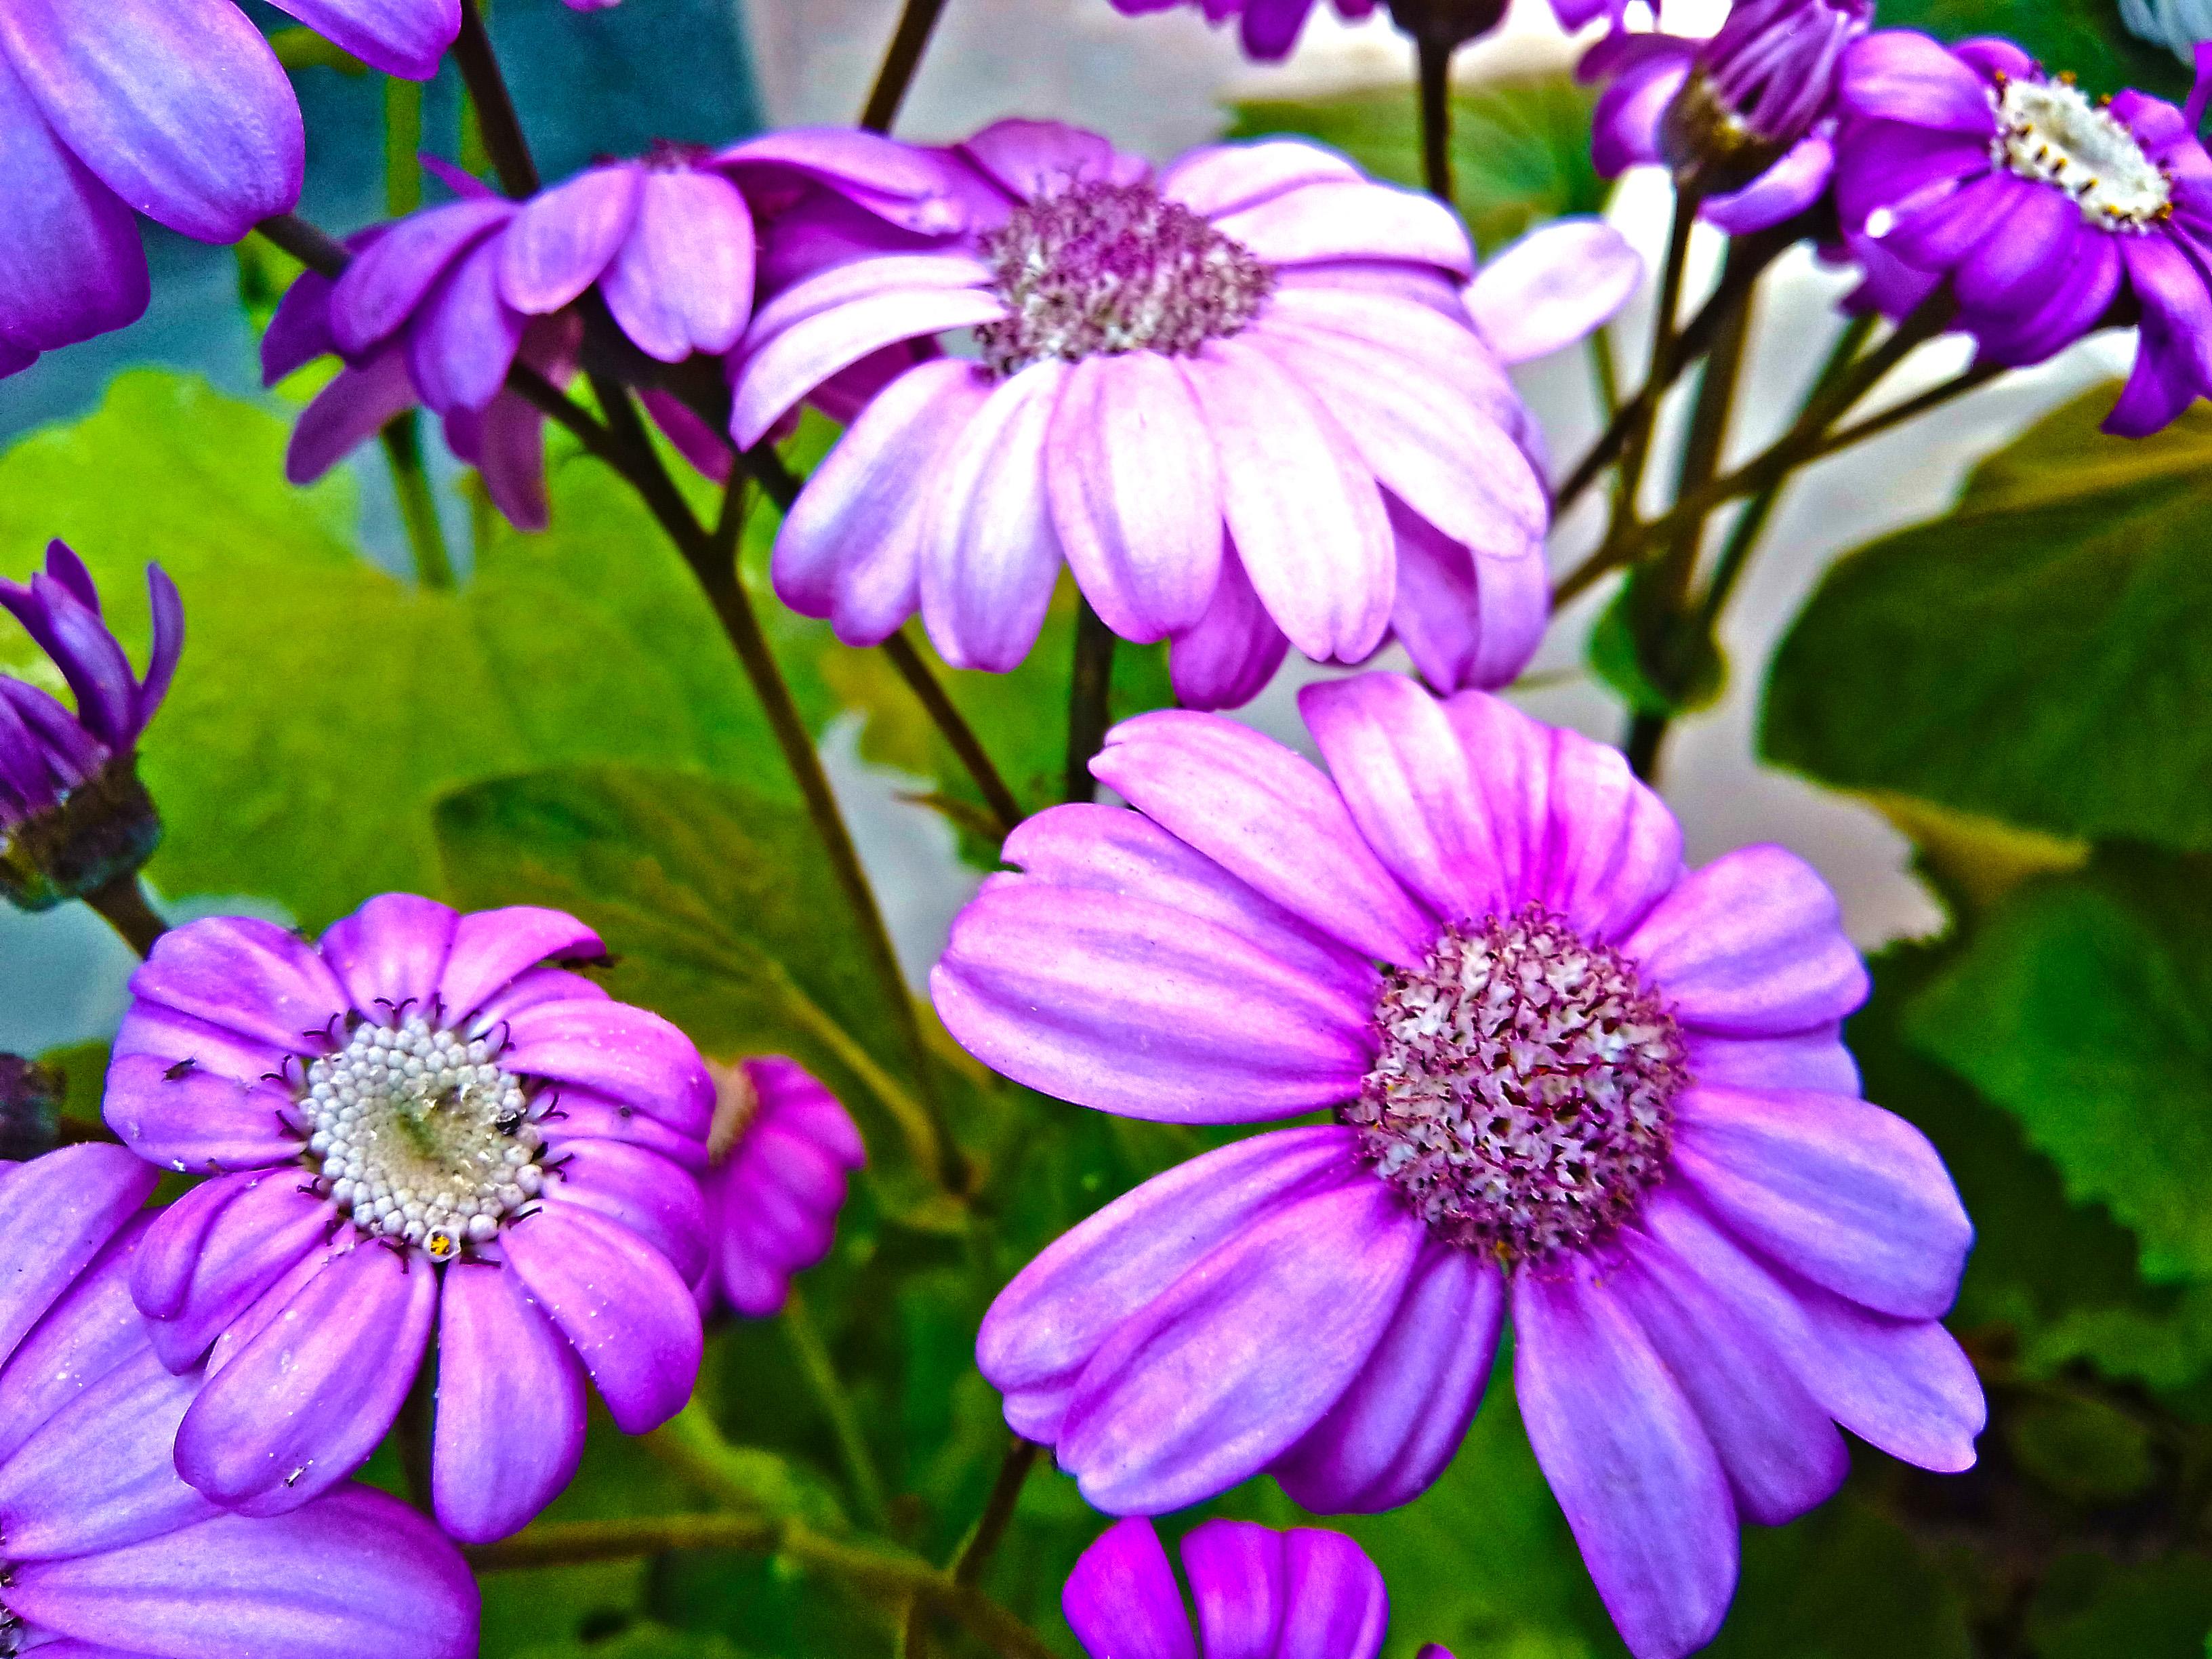 HD flower Wallpaper of Senecio Cruentus